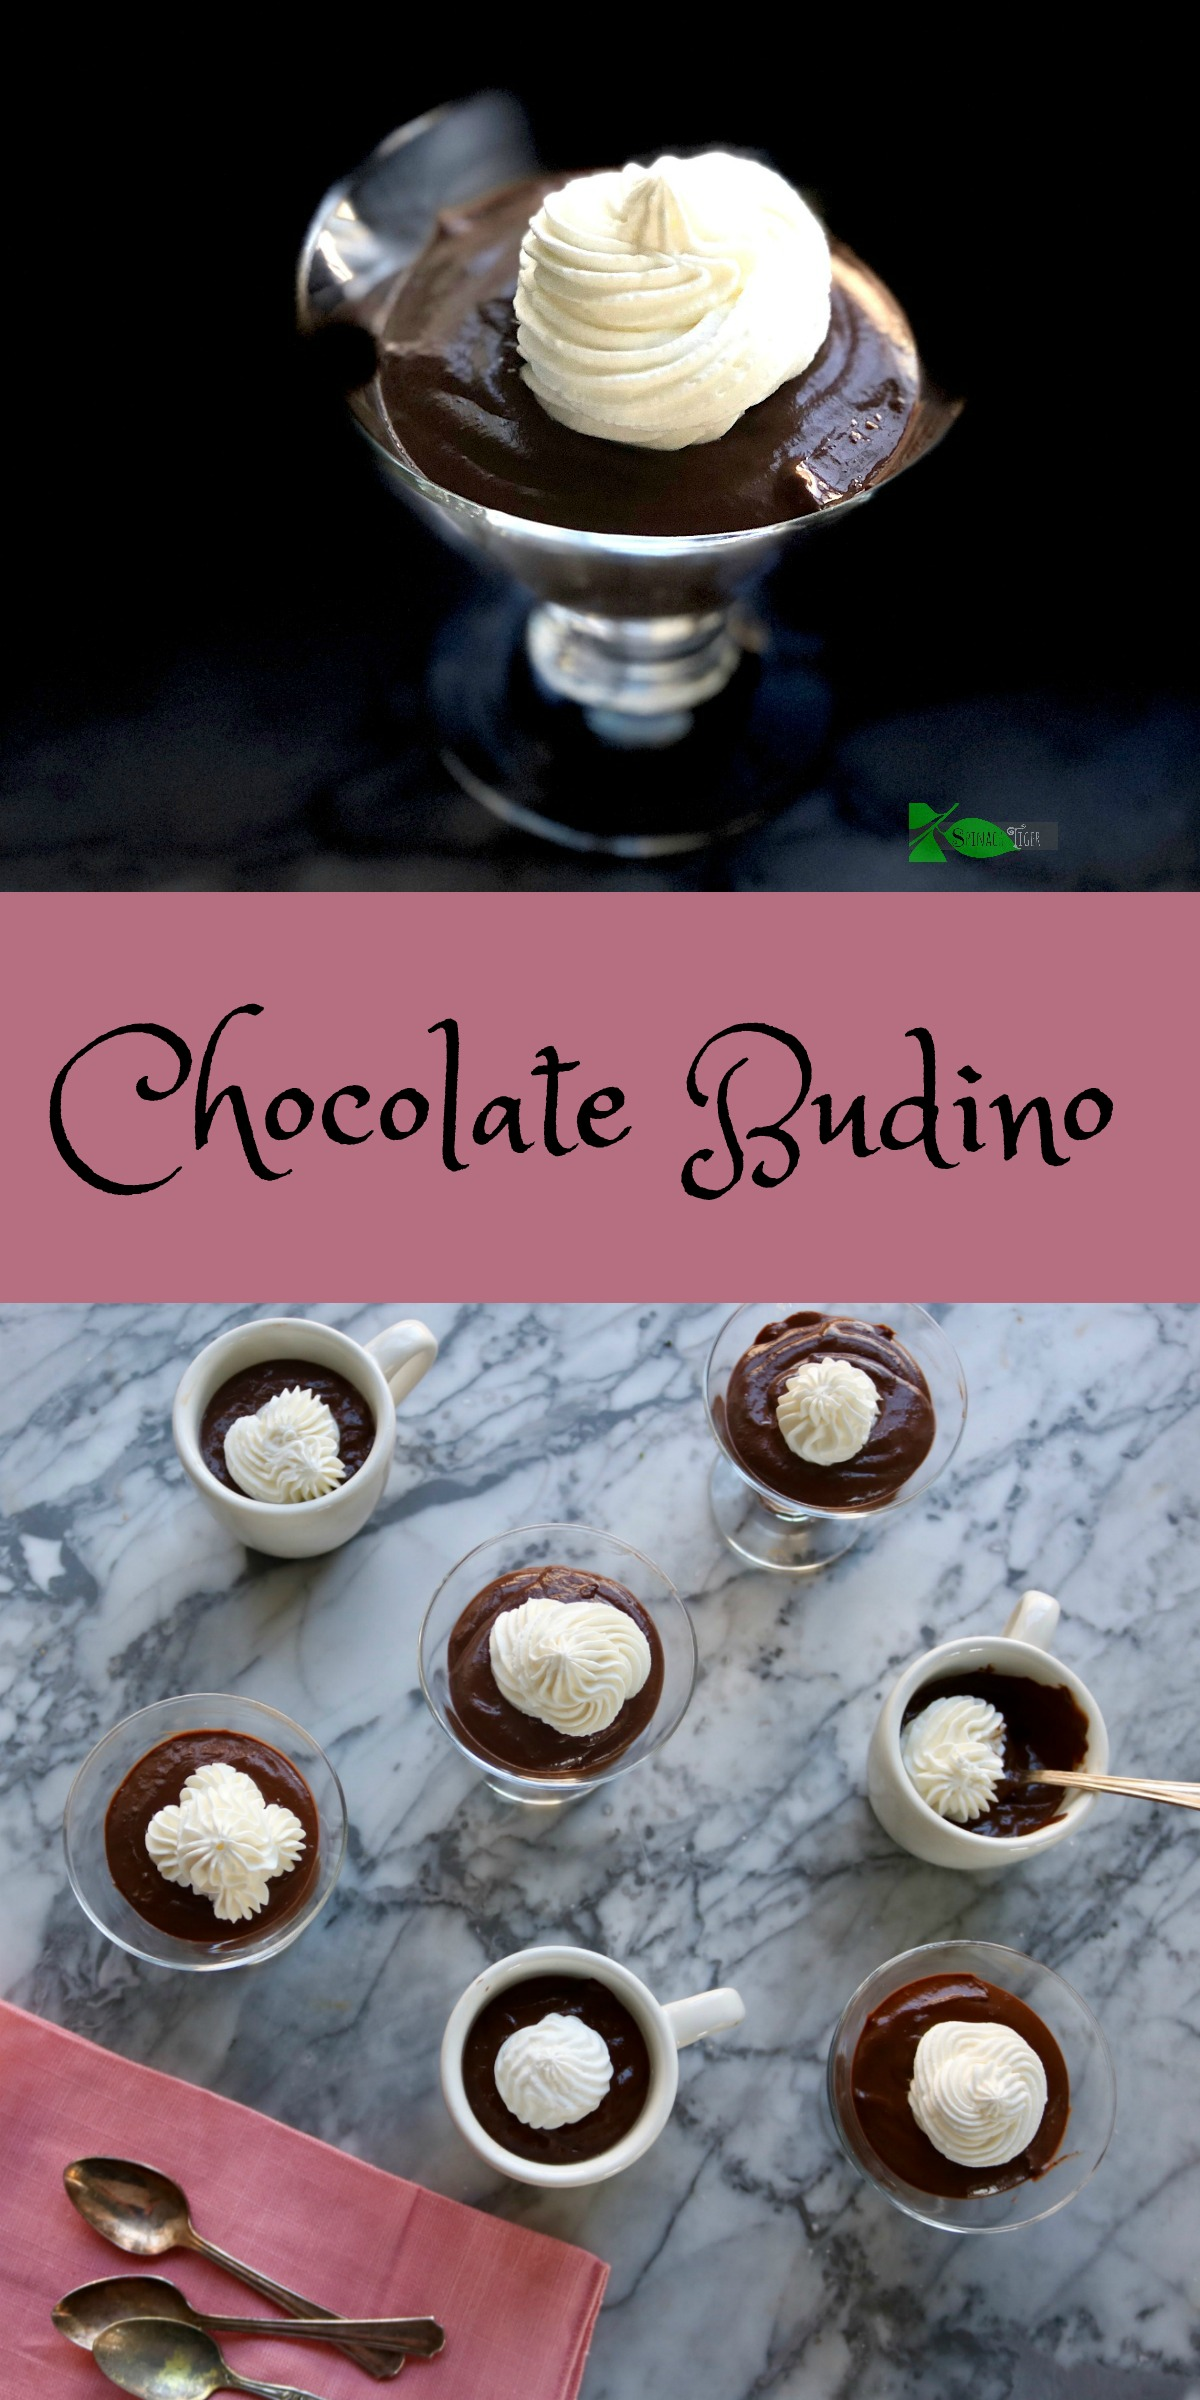 Sugar Free Chocolate Budino Recipe from Spinach Tiger